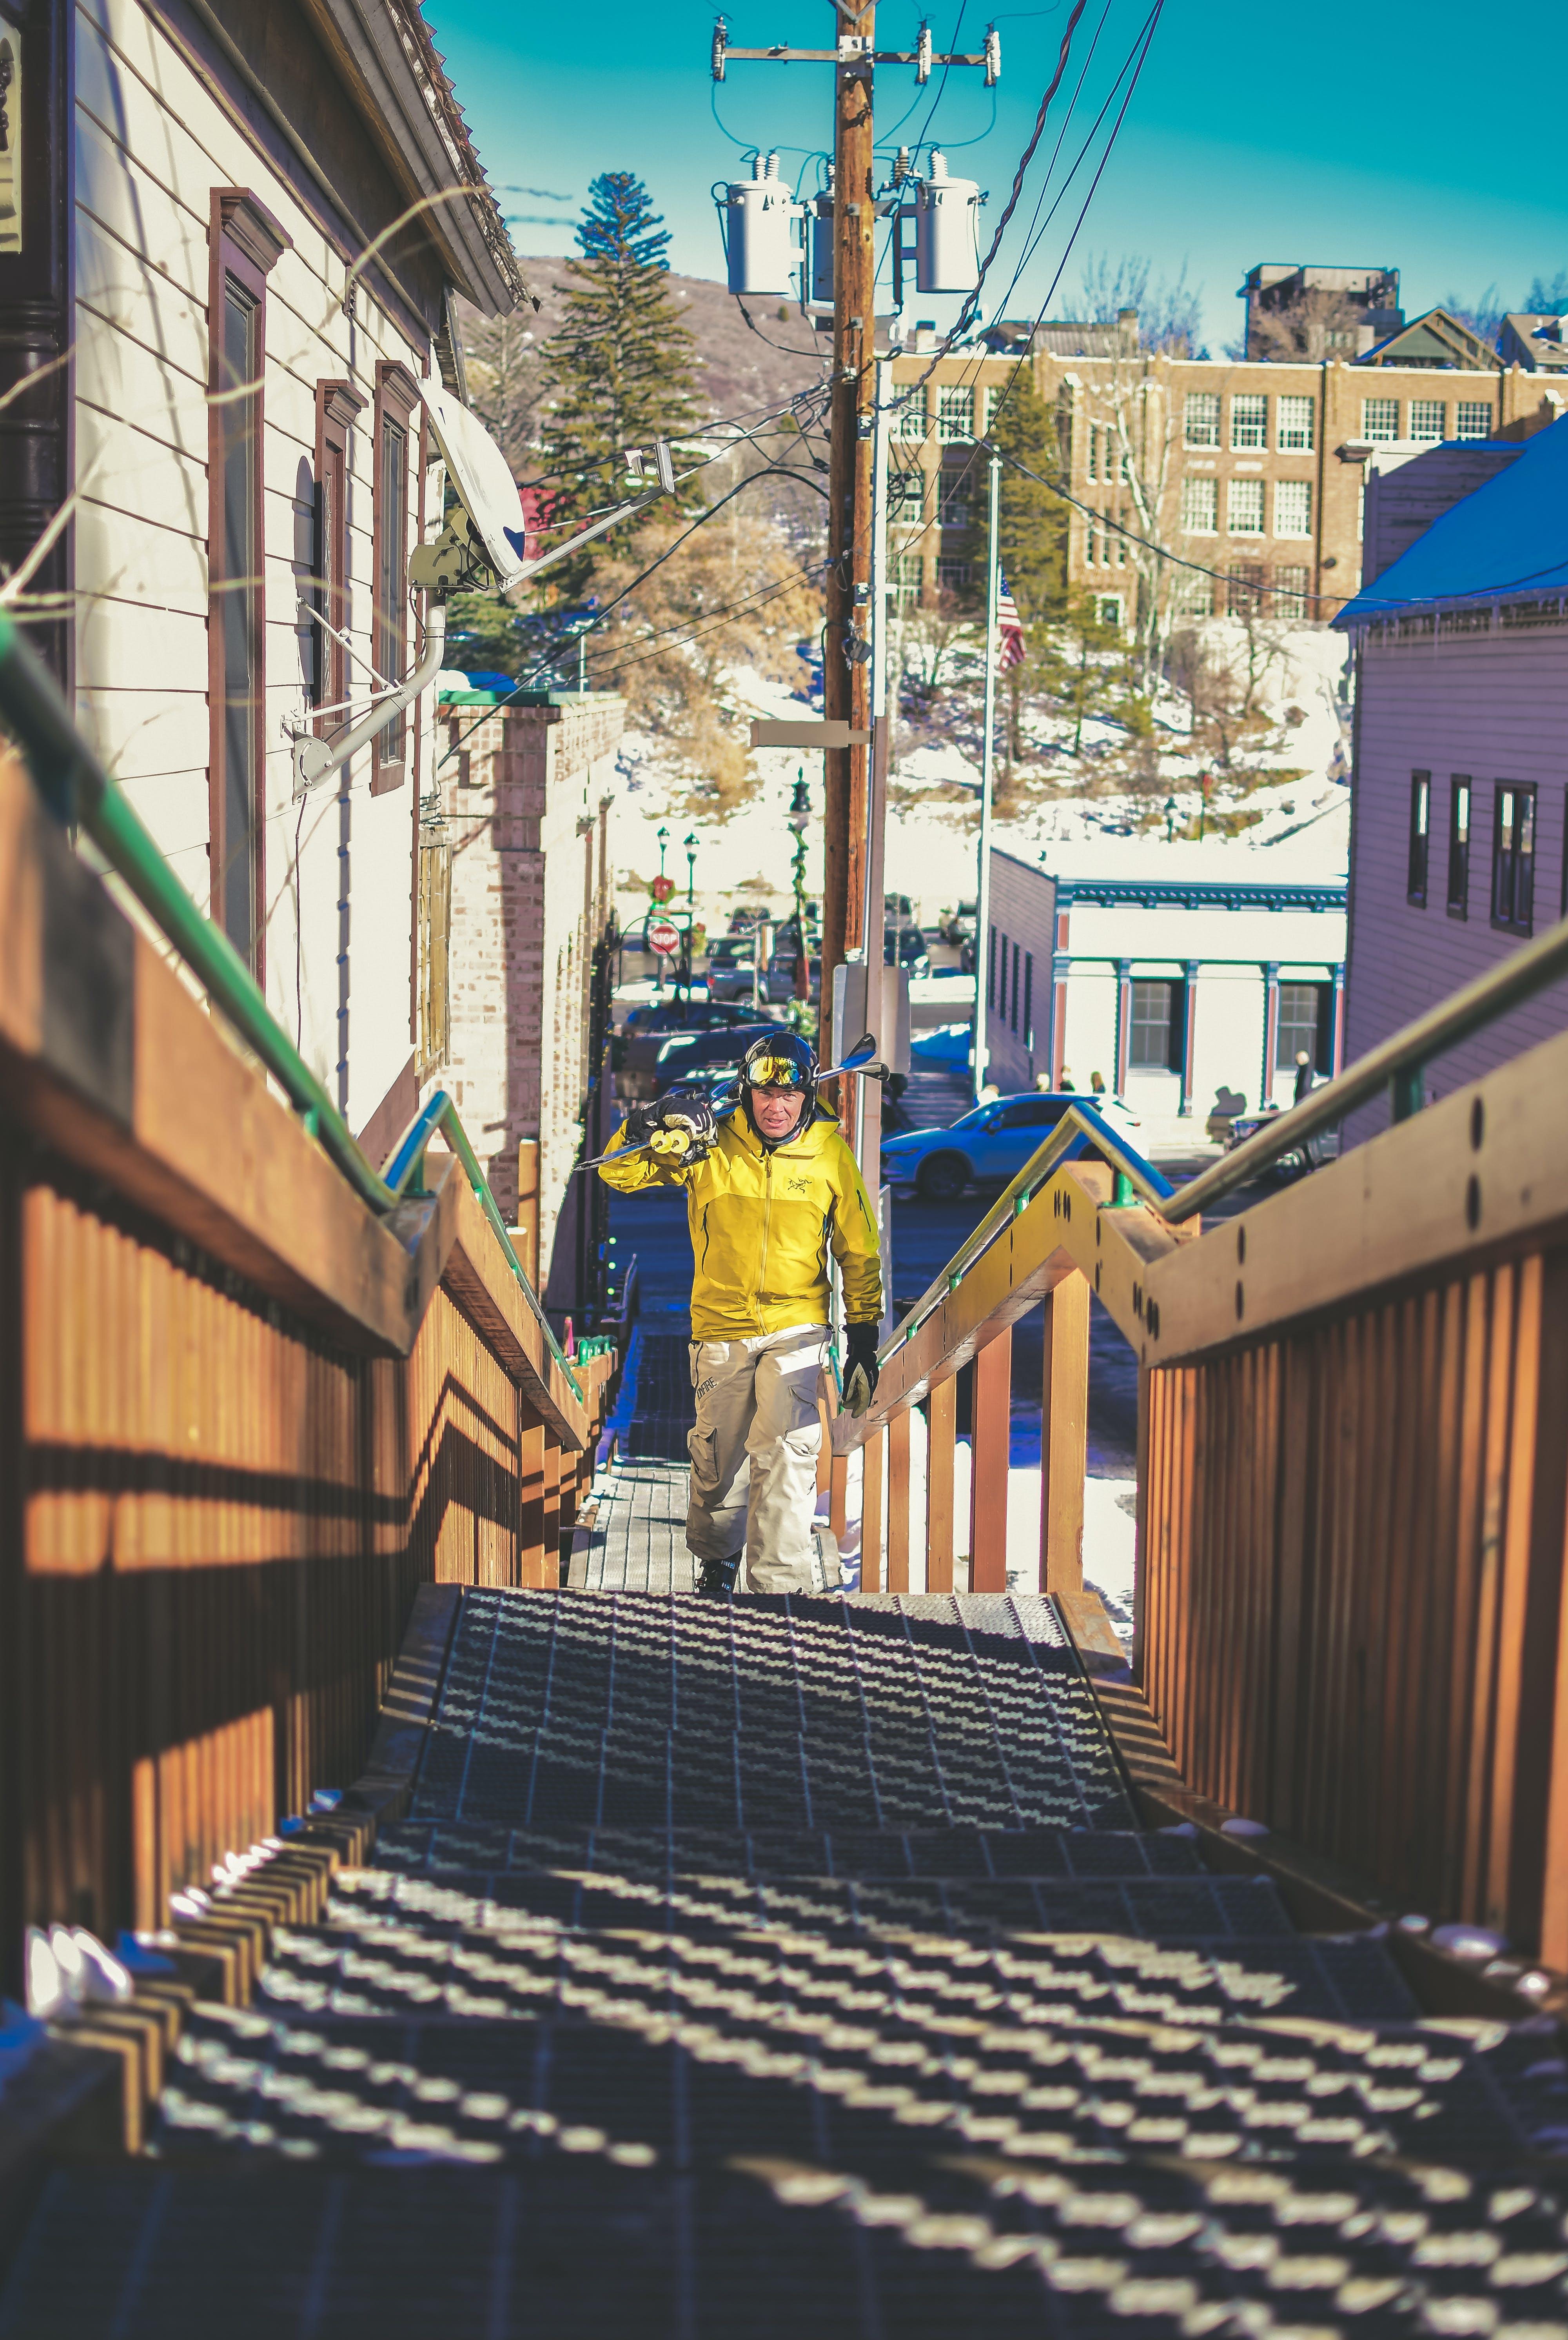 Man in Yellow Jacket Climbing Stairs